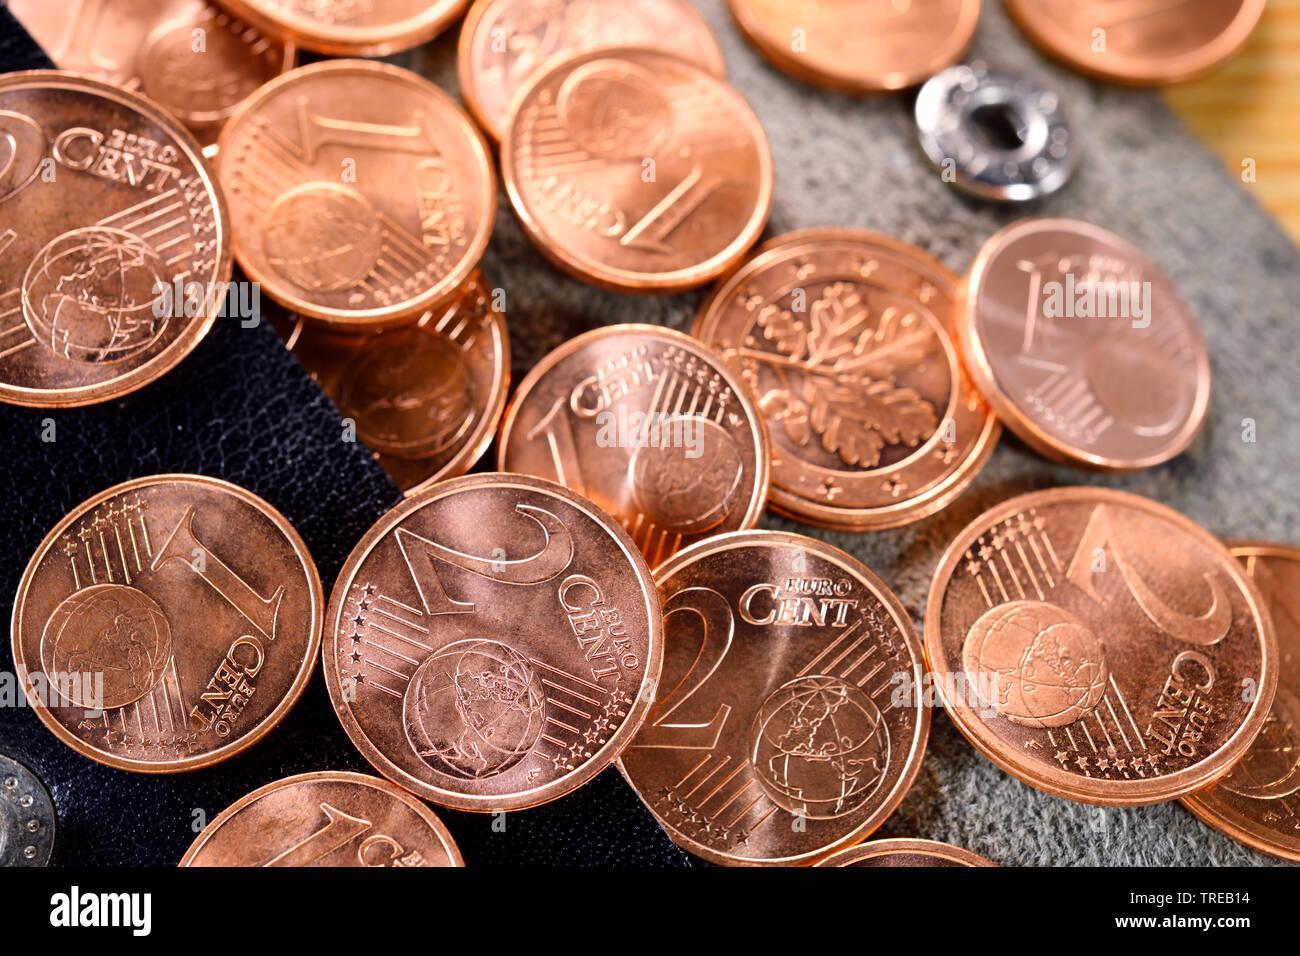 1- und 2-Centmuenzen - Diskussion ueber Abschaffung von Kleingeld   1 and 2 Cent coins - discussion about abolishing of coppers   BLWS521778.jpg [ (c) - Stock Image